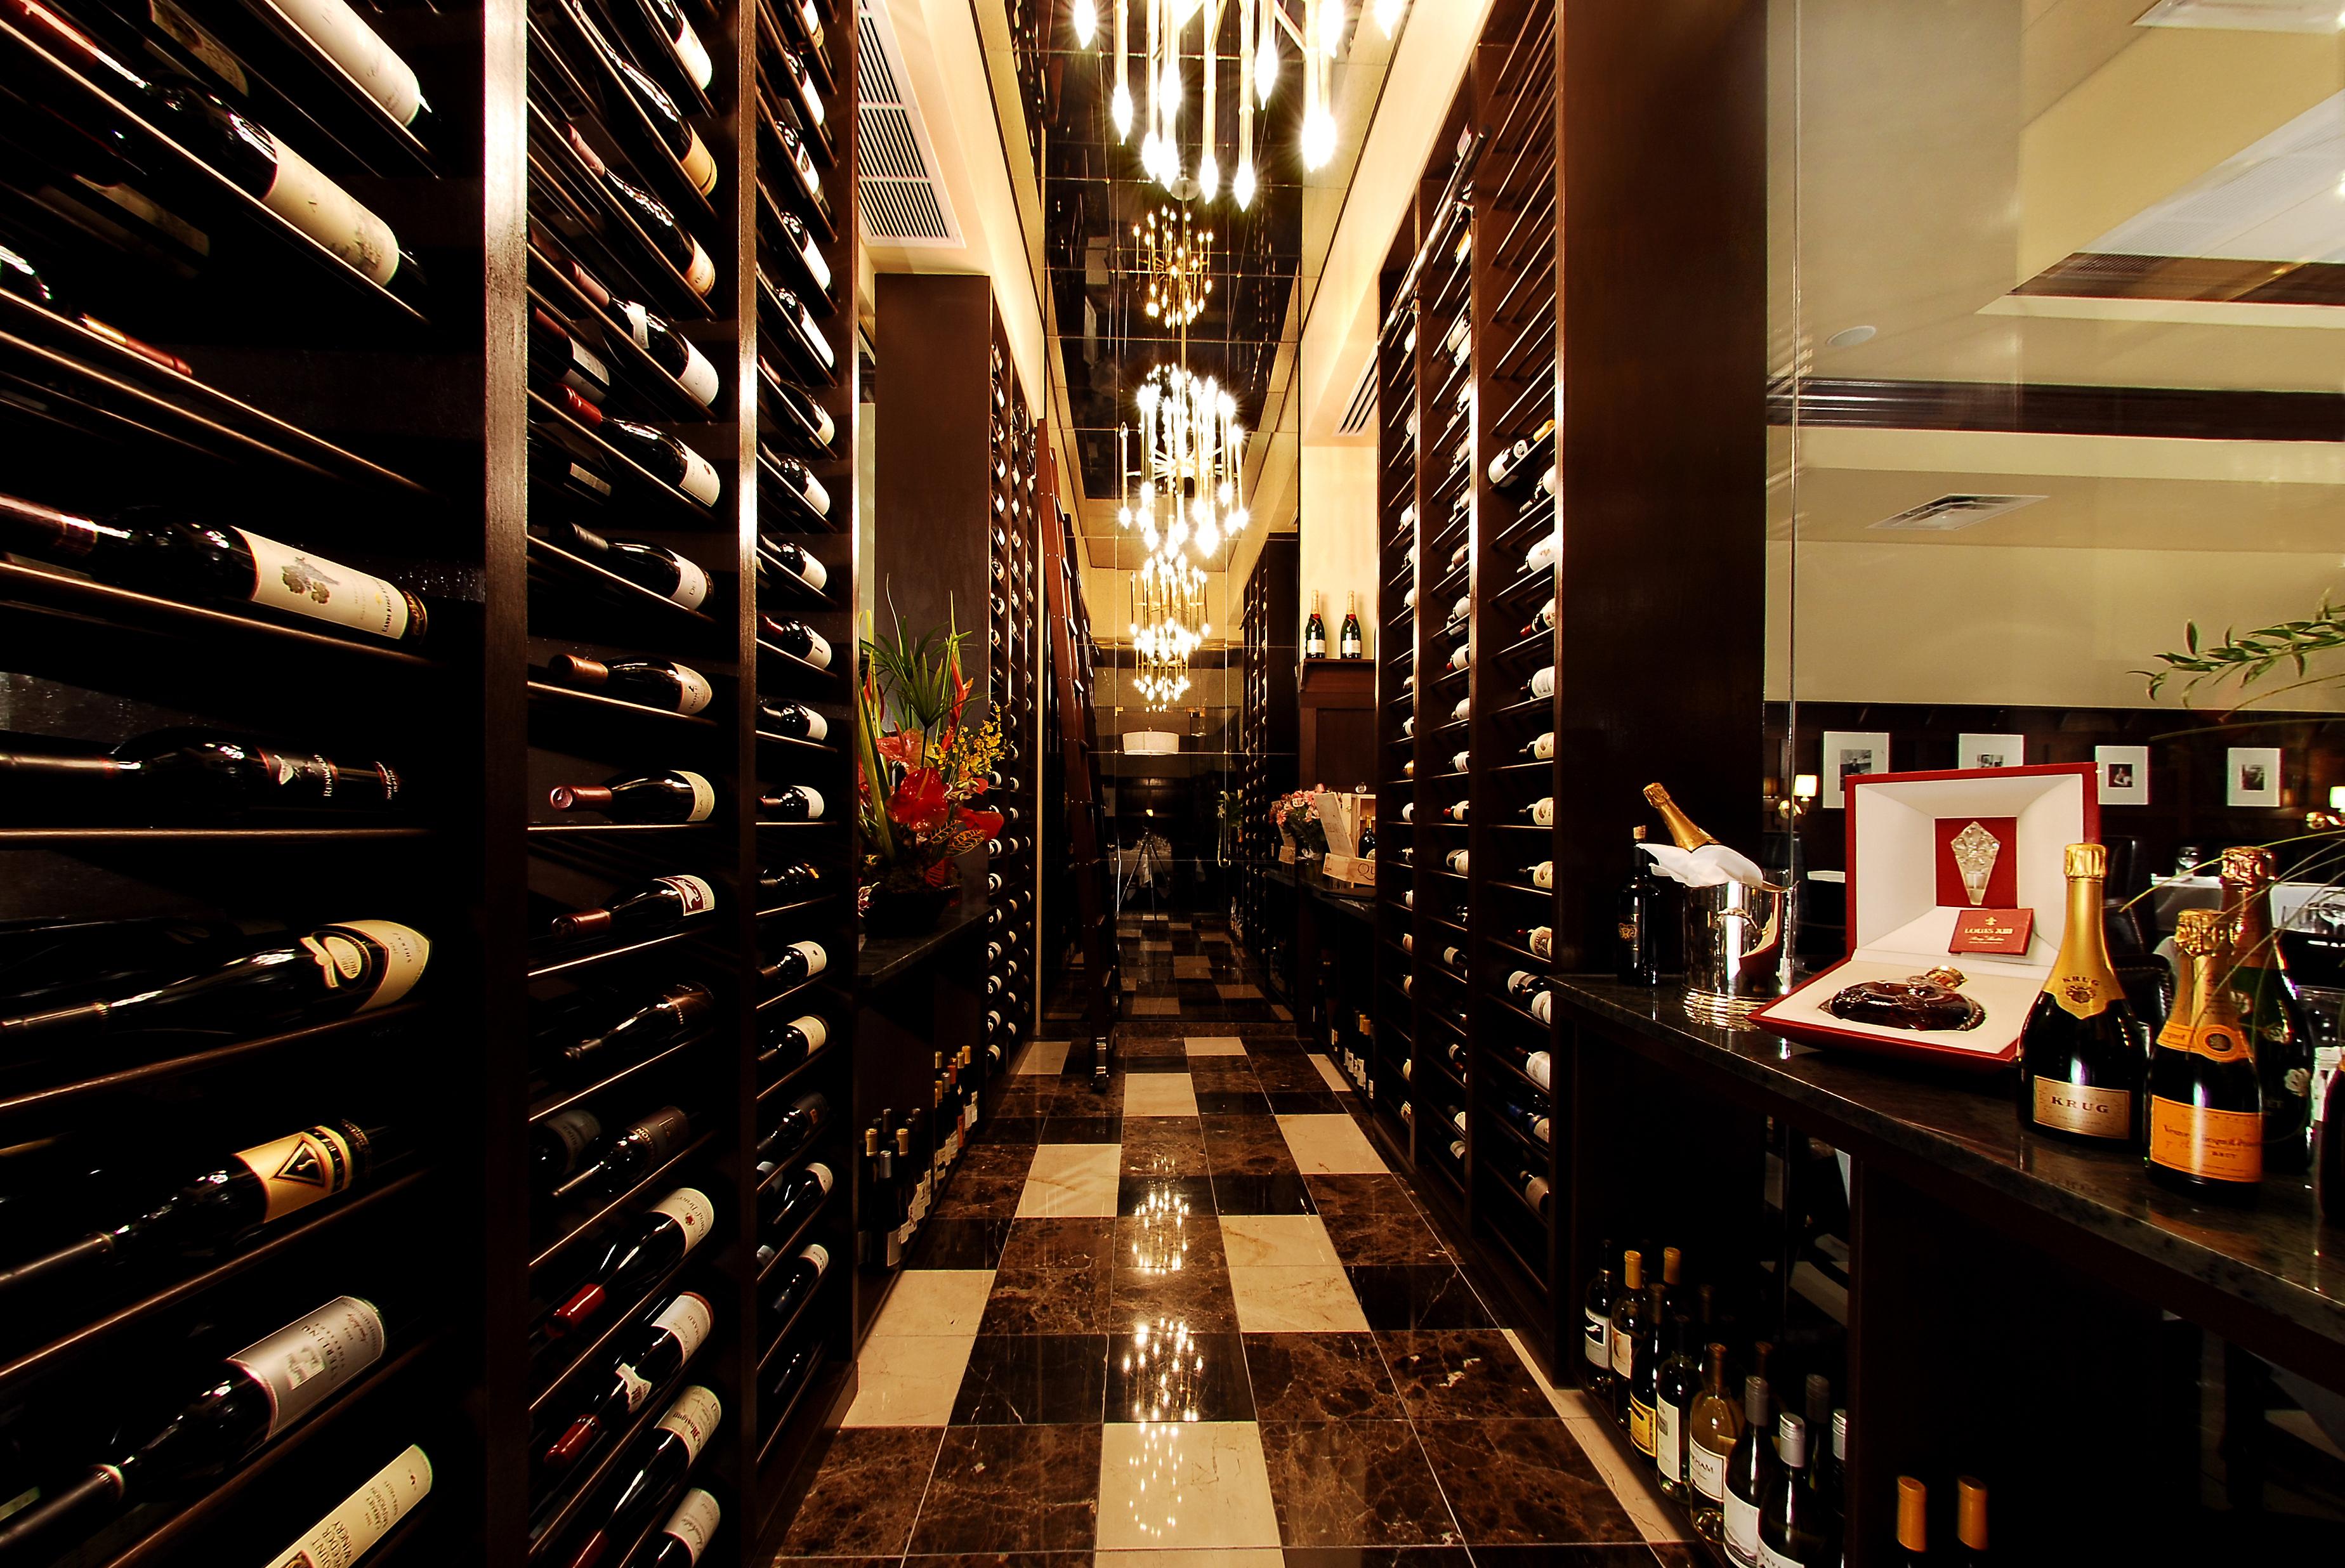 III Forks Wine Cellar - Iii Forks Palm Beach Gardens Fl 33418